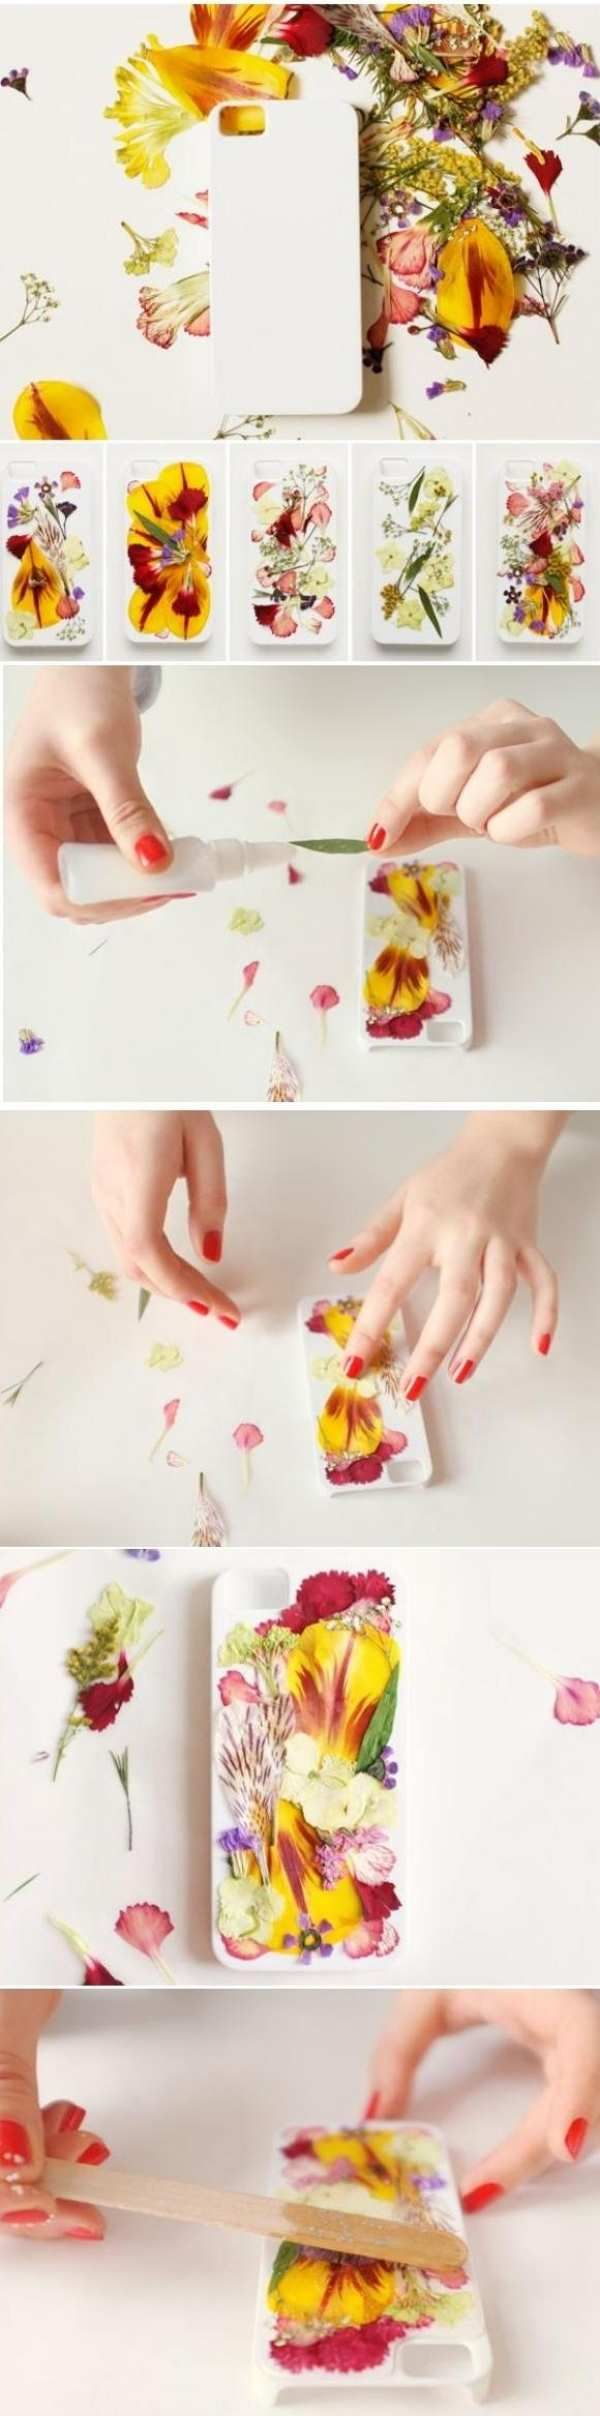 Gestaltungsideen für iPhone schutzhülle-Blütenblätter